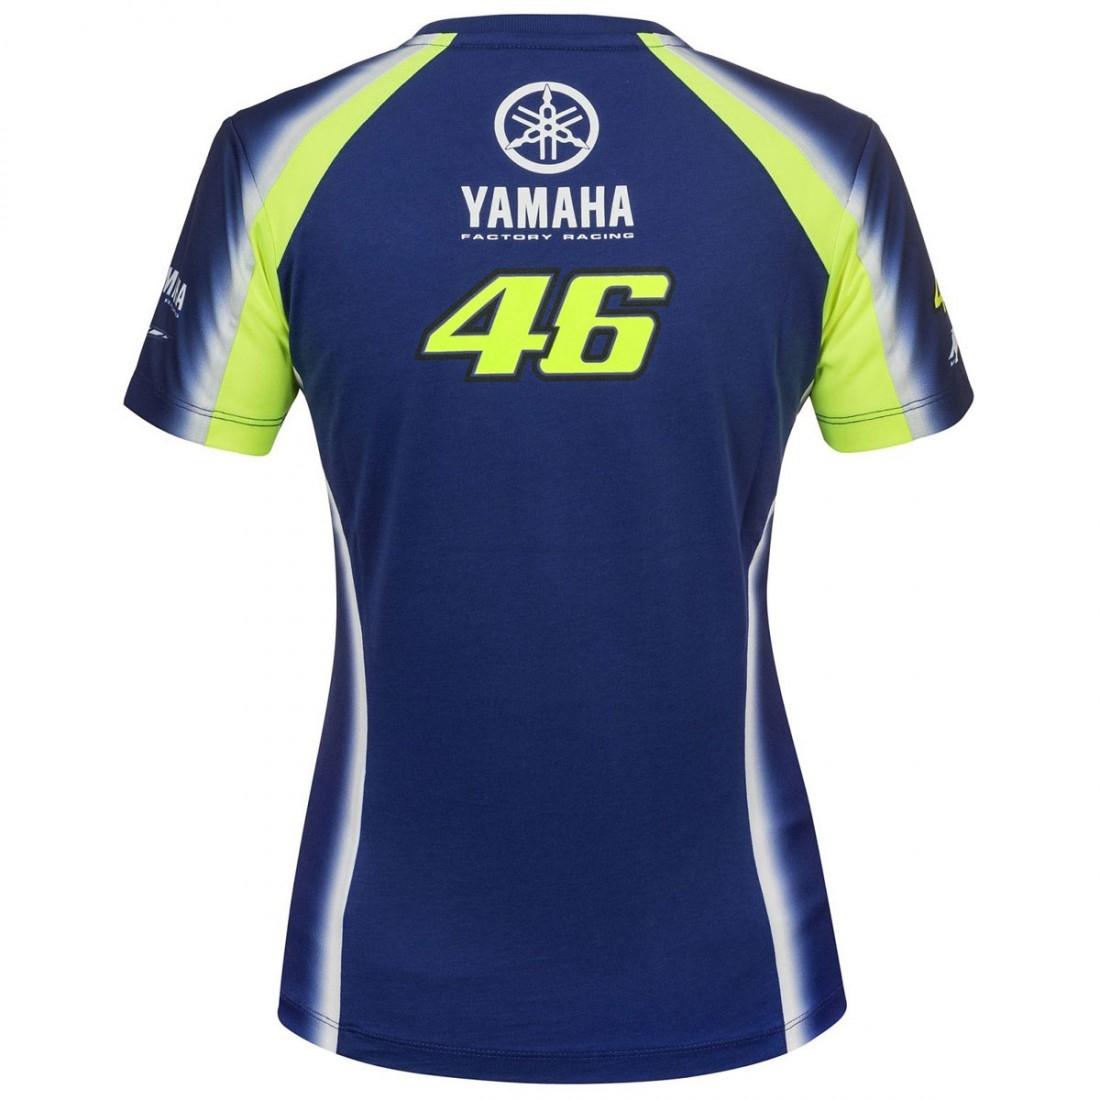 Camiseta VR46 Yamaha Valentino Rossi VR 46 314309 Lady · Motocard d1d8e66593b71